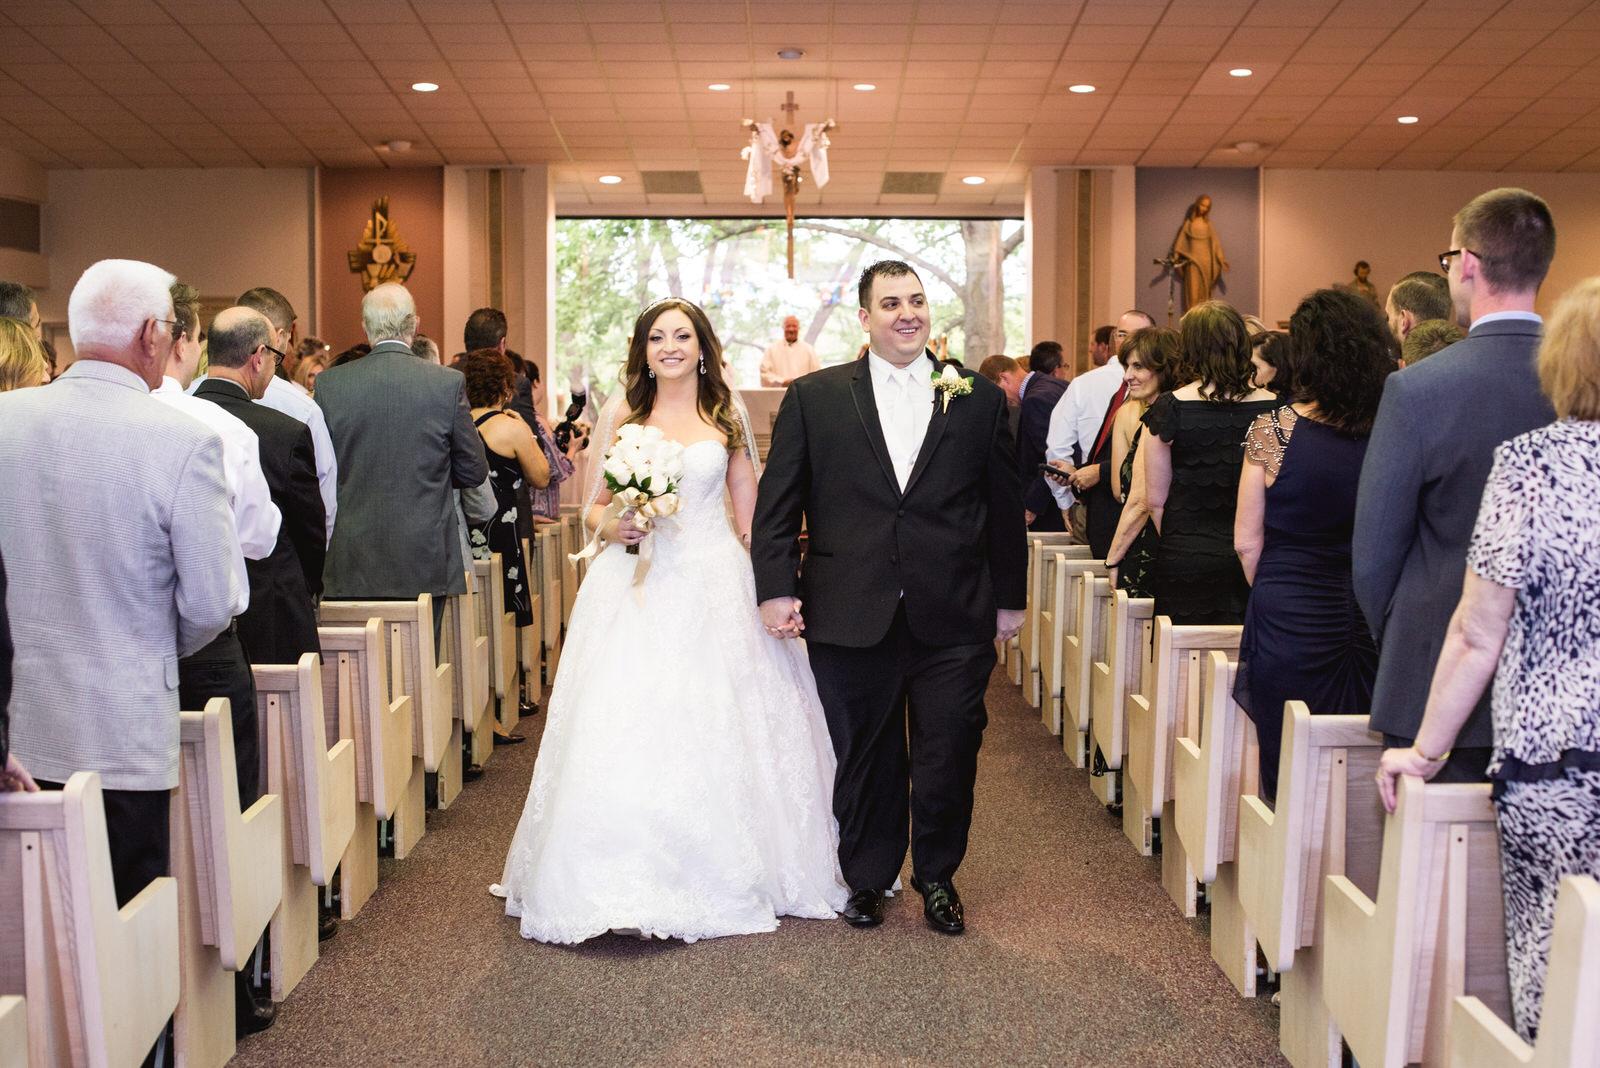 Laube_Banquet_Hall__Wedding_Photos_007.jpg